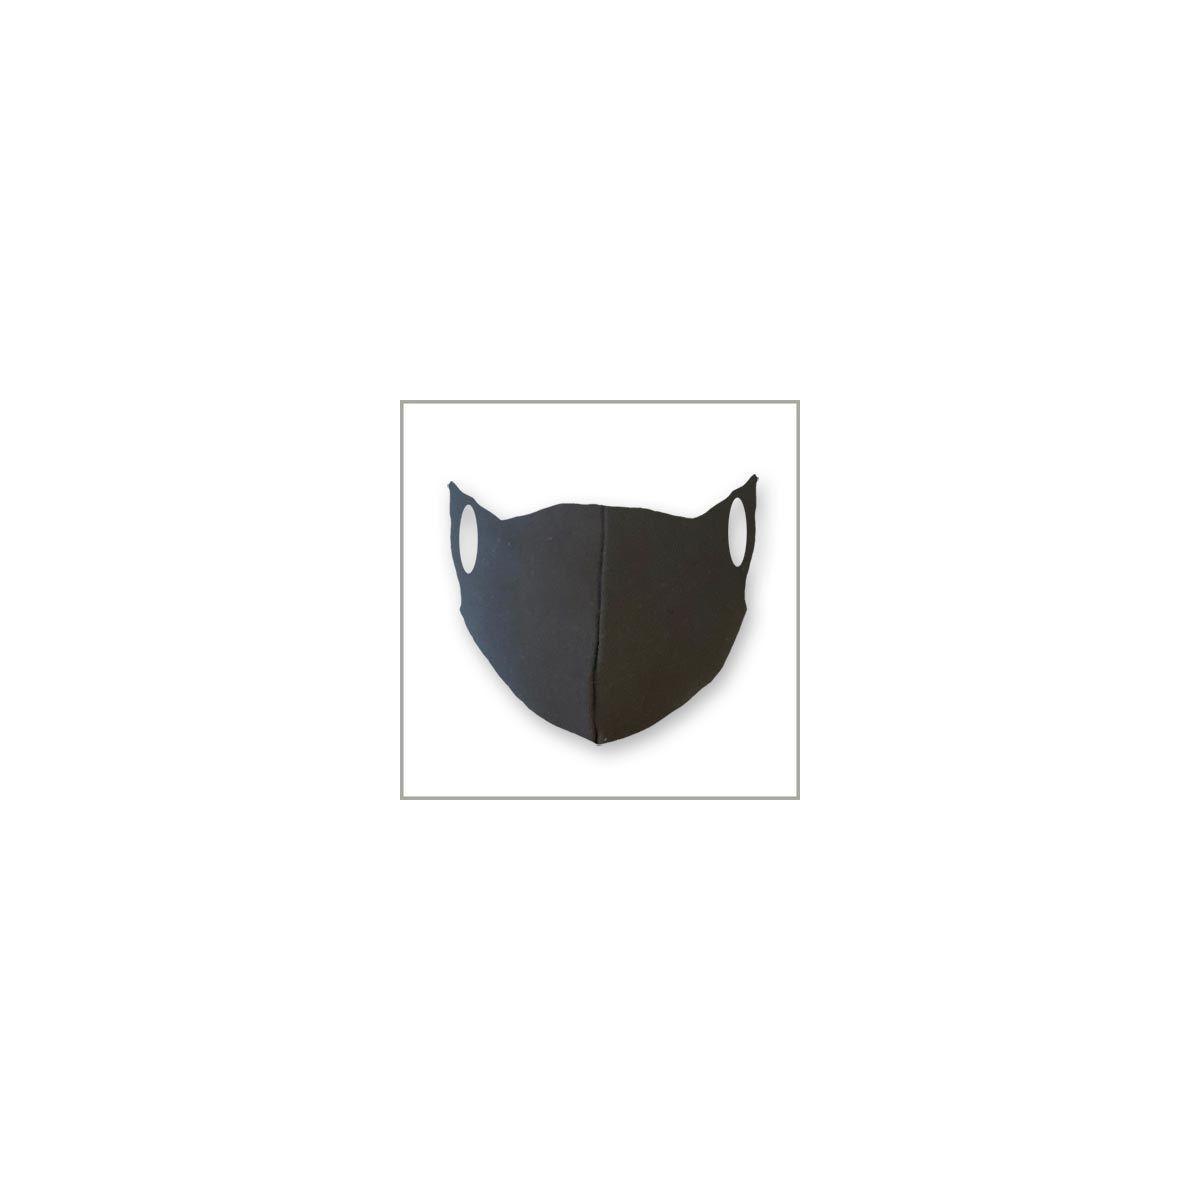 Washable Face Mask & Filter